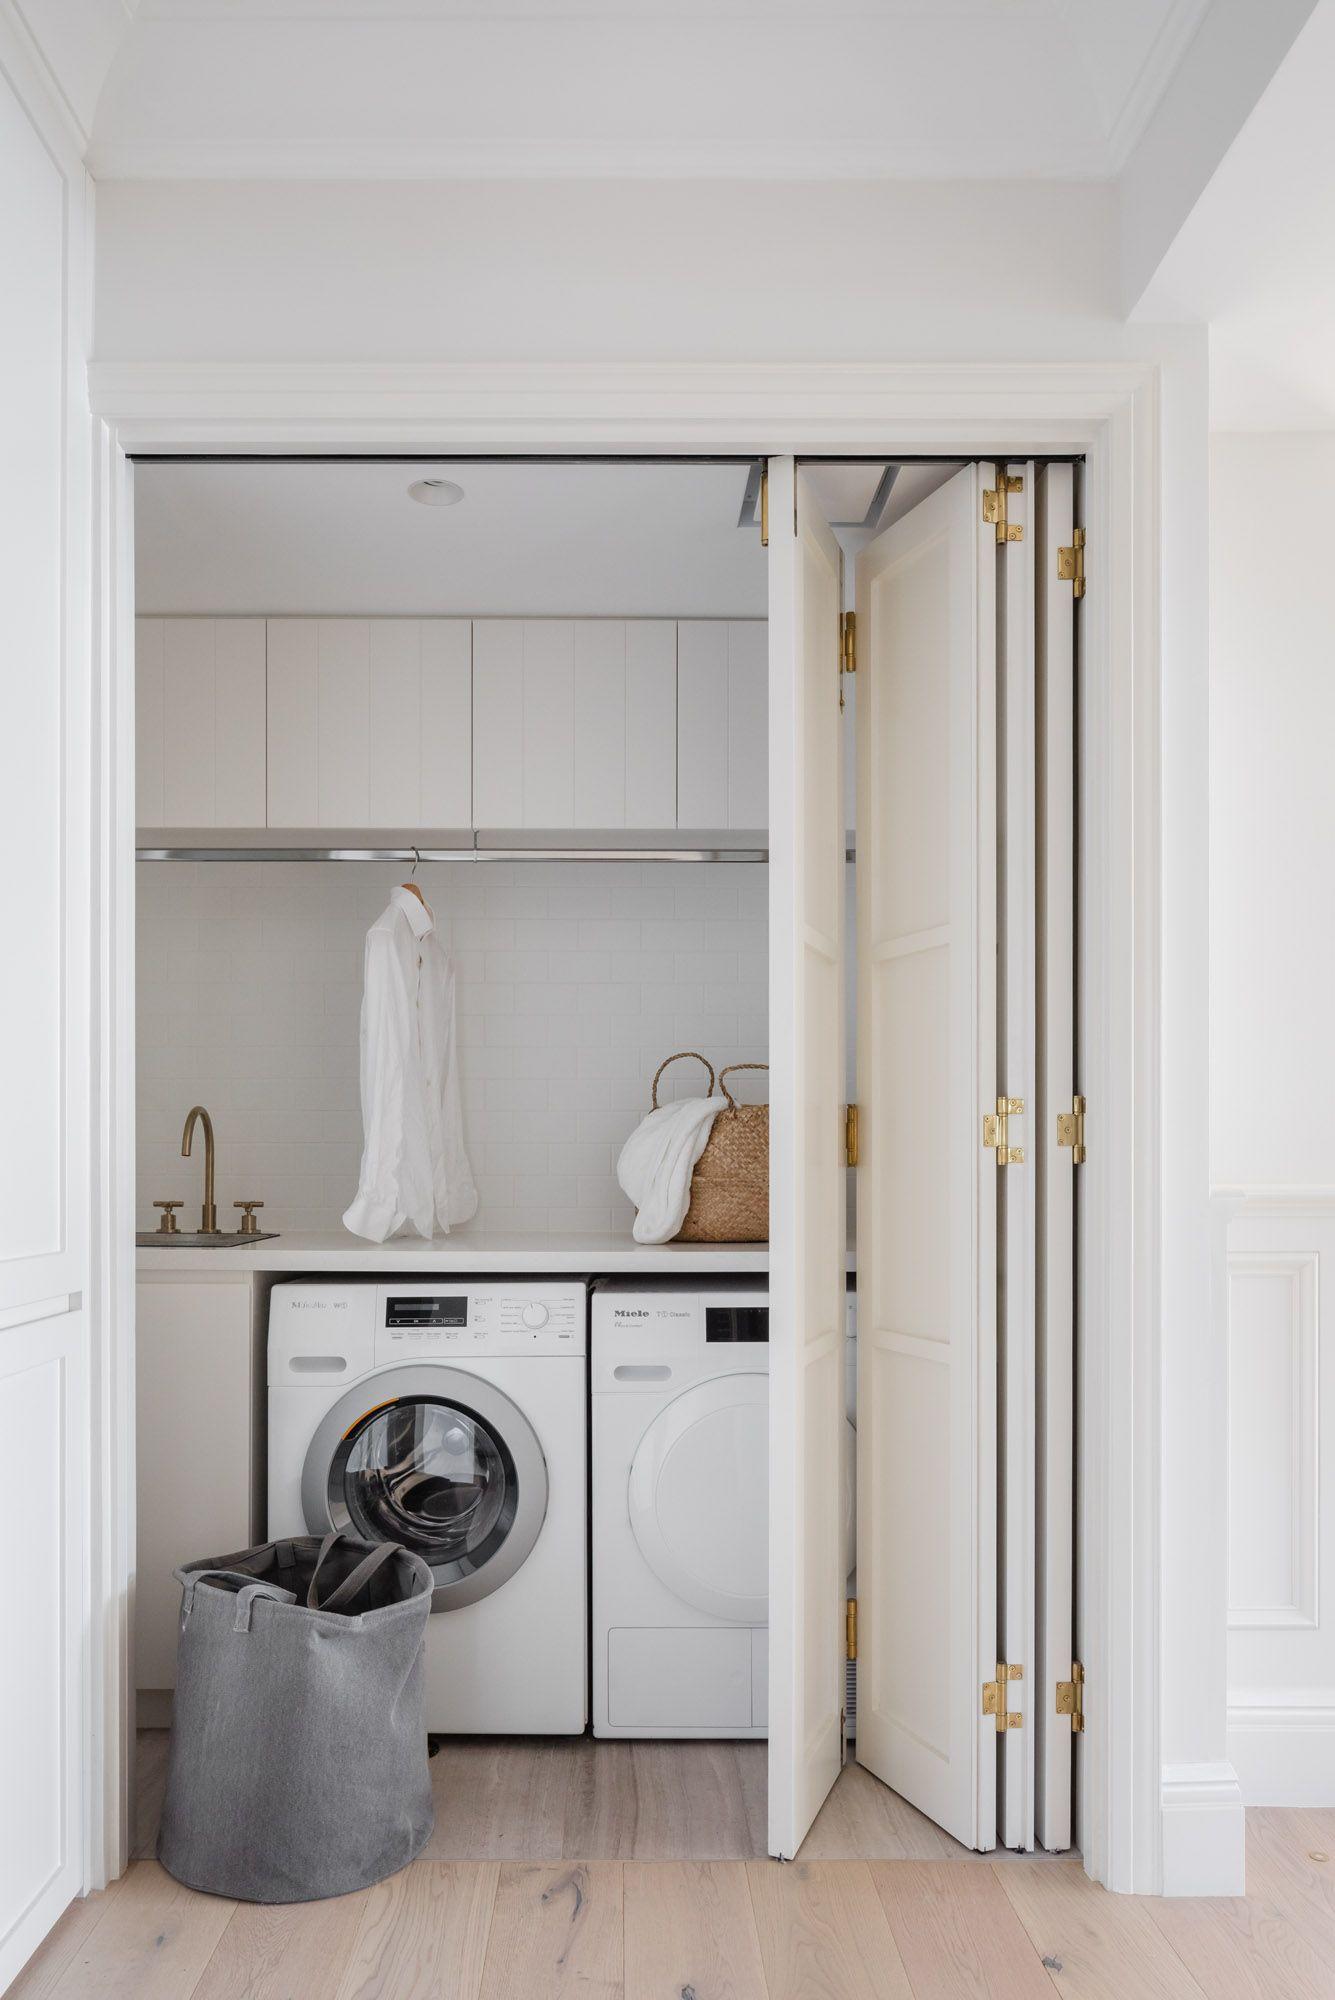 Danmark Heritage Refurbishment Intrim Mouldings Laundry Room Design Laundry Doors Laundry In Bathroom